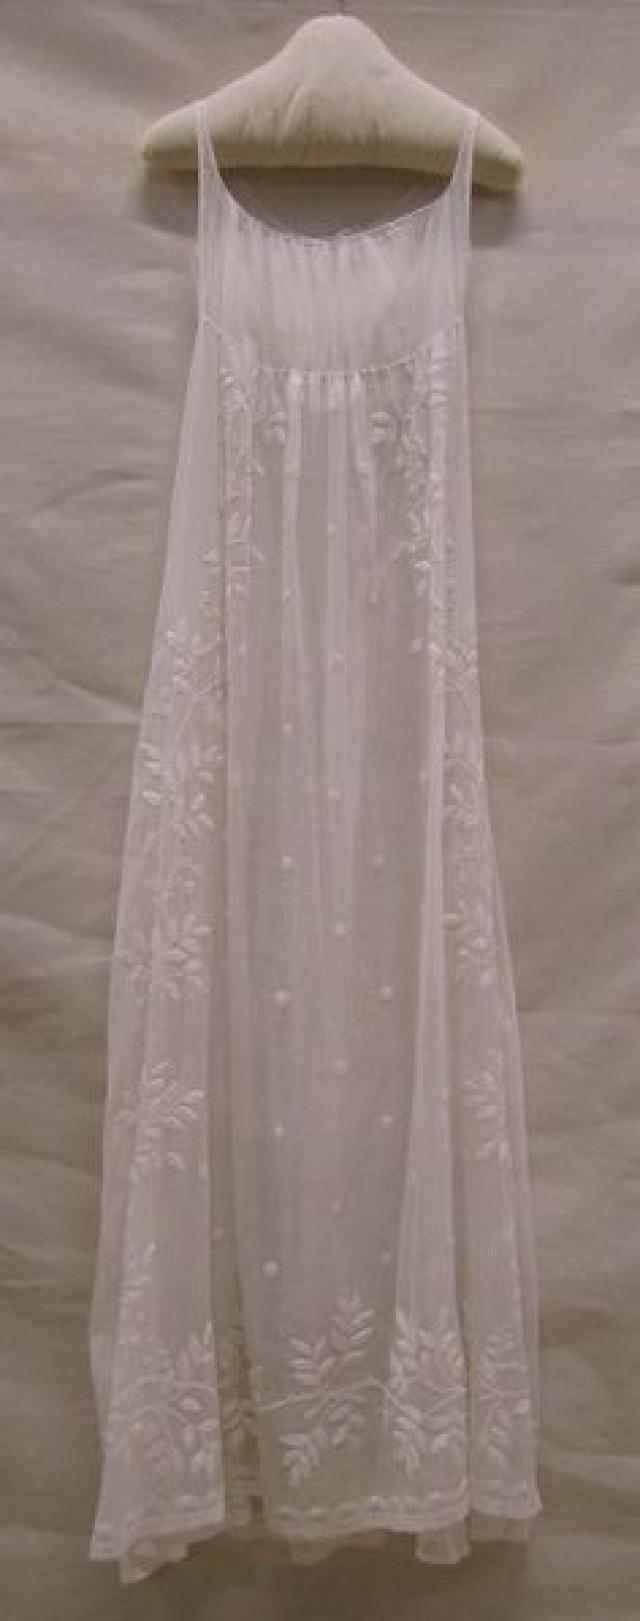 Wedding underwear weddings bridal lingerie 2201142 for Corset bras for wedding dresses